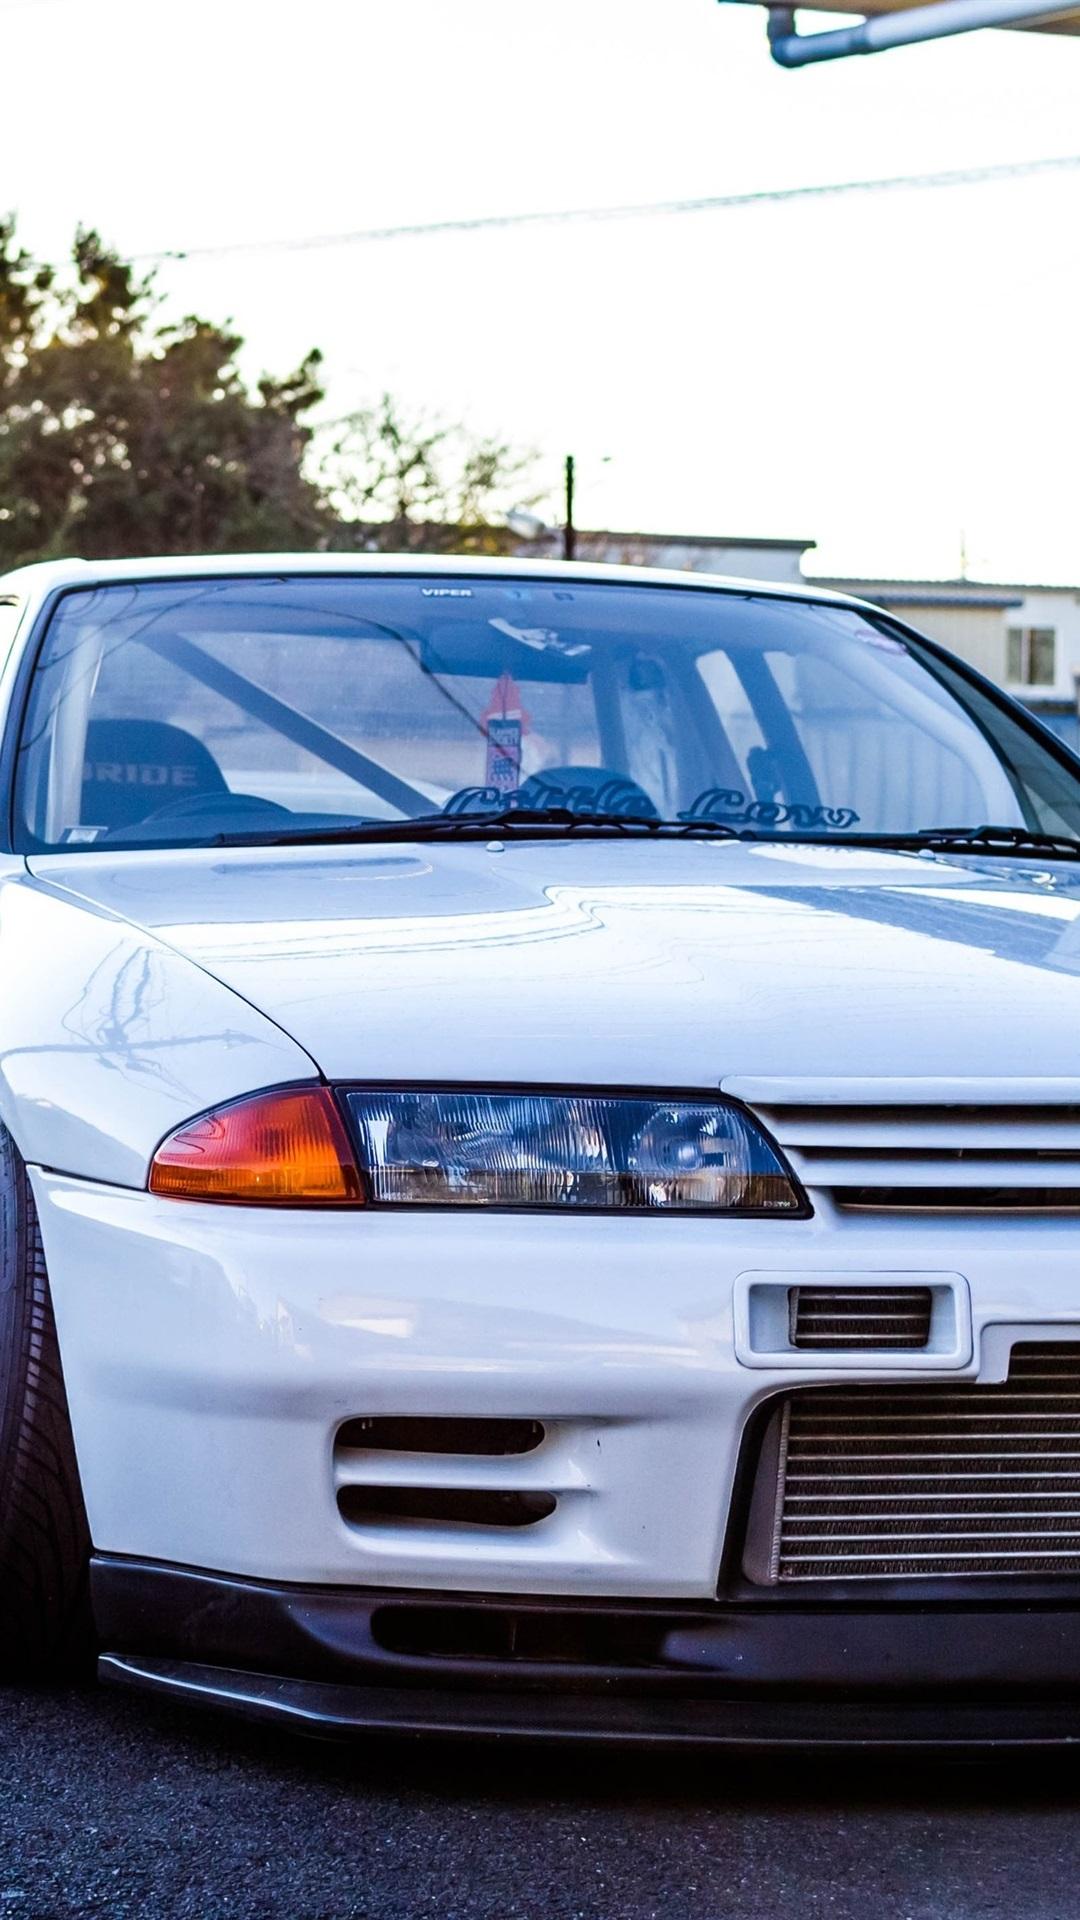 Nissan Gtr R32 Skyline White Classic Car 1080x1920 Iphone 8